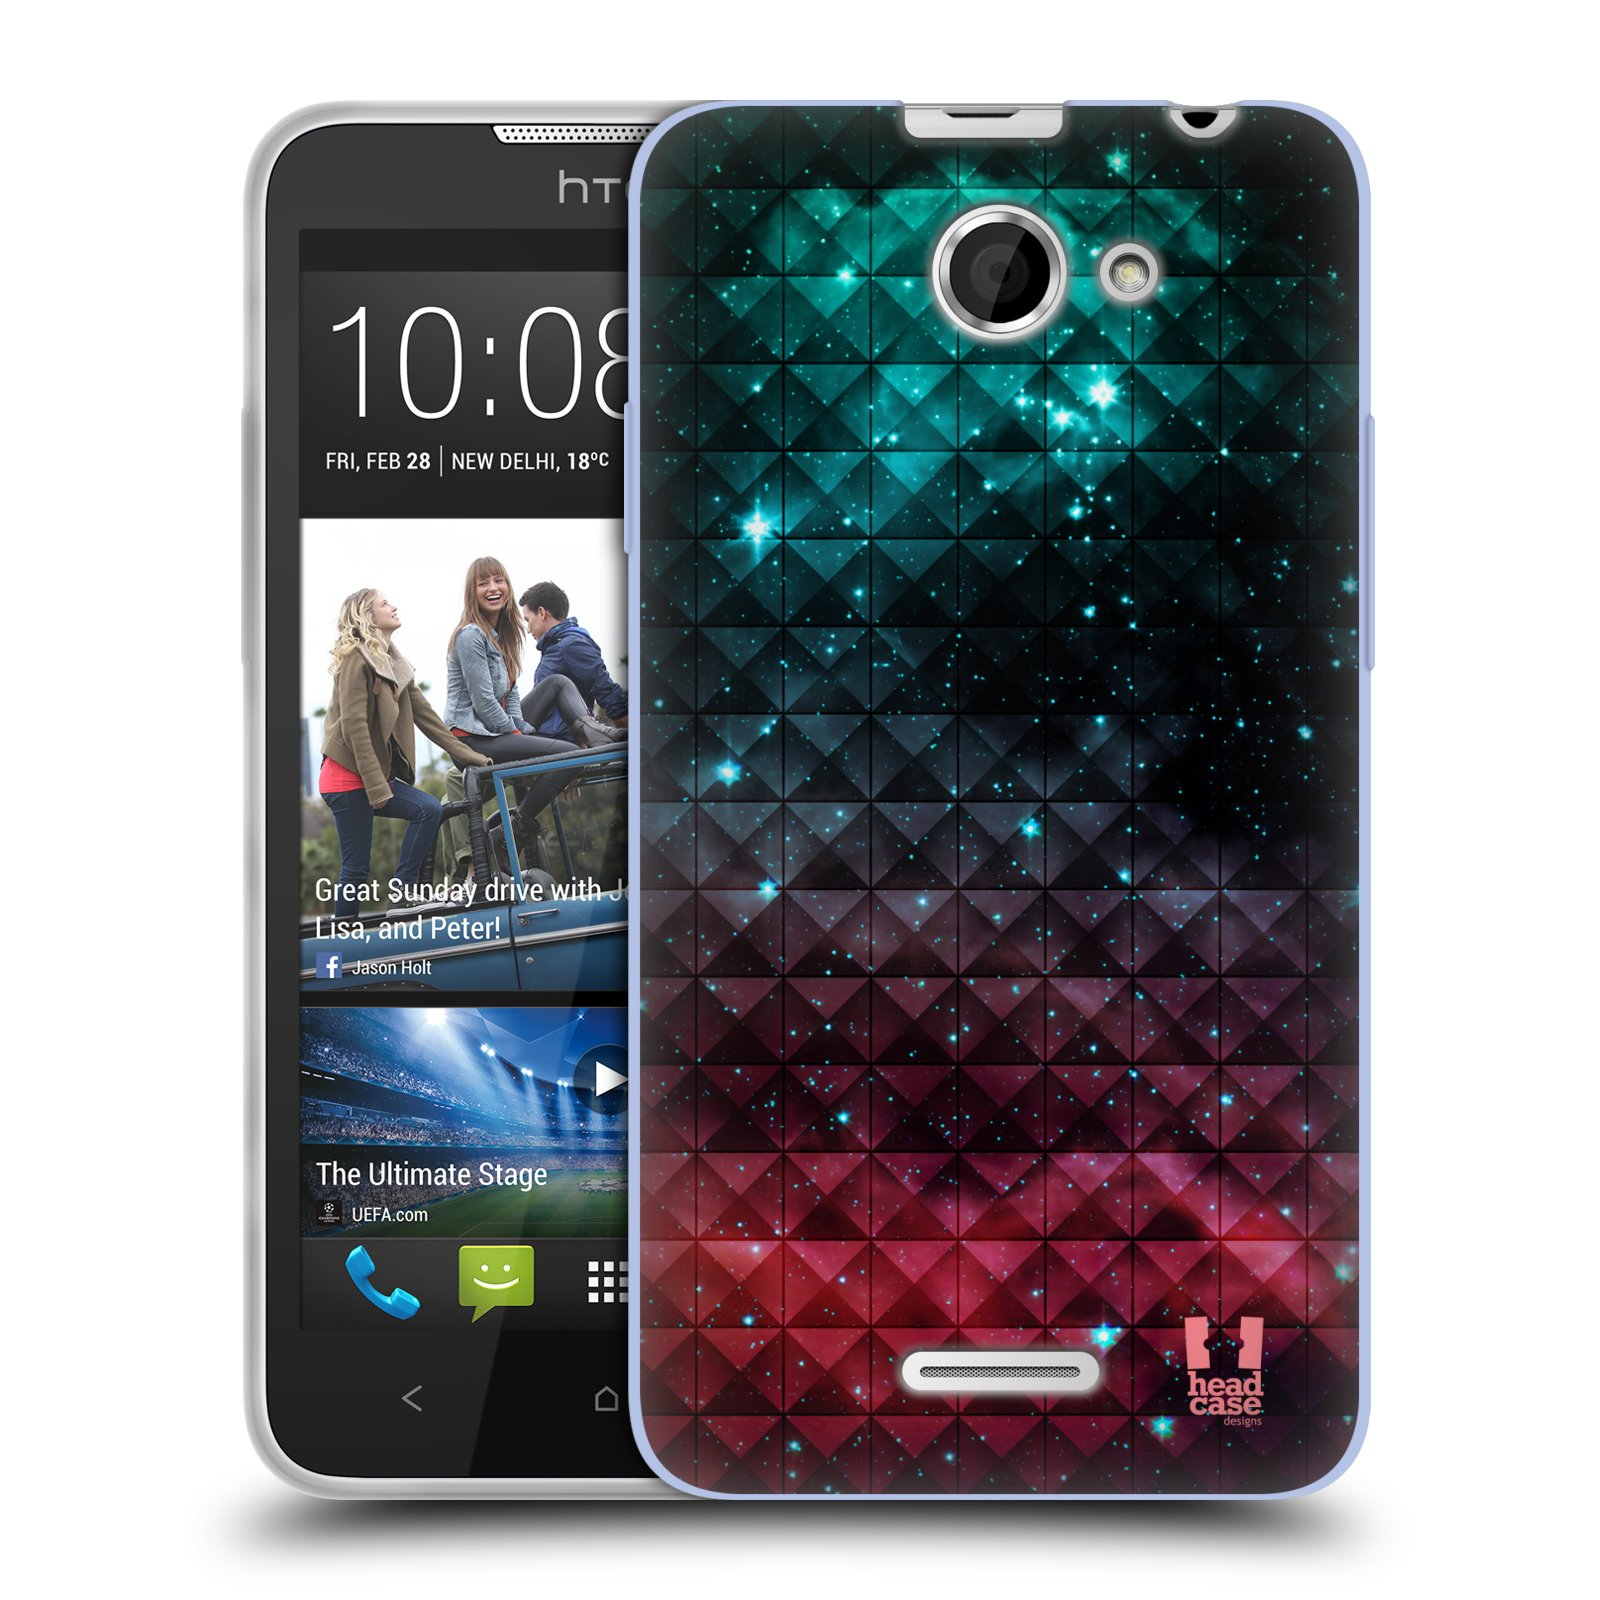 Silikonové pouzdro na mobil HTC Desire 516 HEAD CASE OMBRE SPARKLE (Silikonový kryt či obal na mobilní telefon HTC Desire 516 Dual SIM)